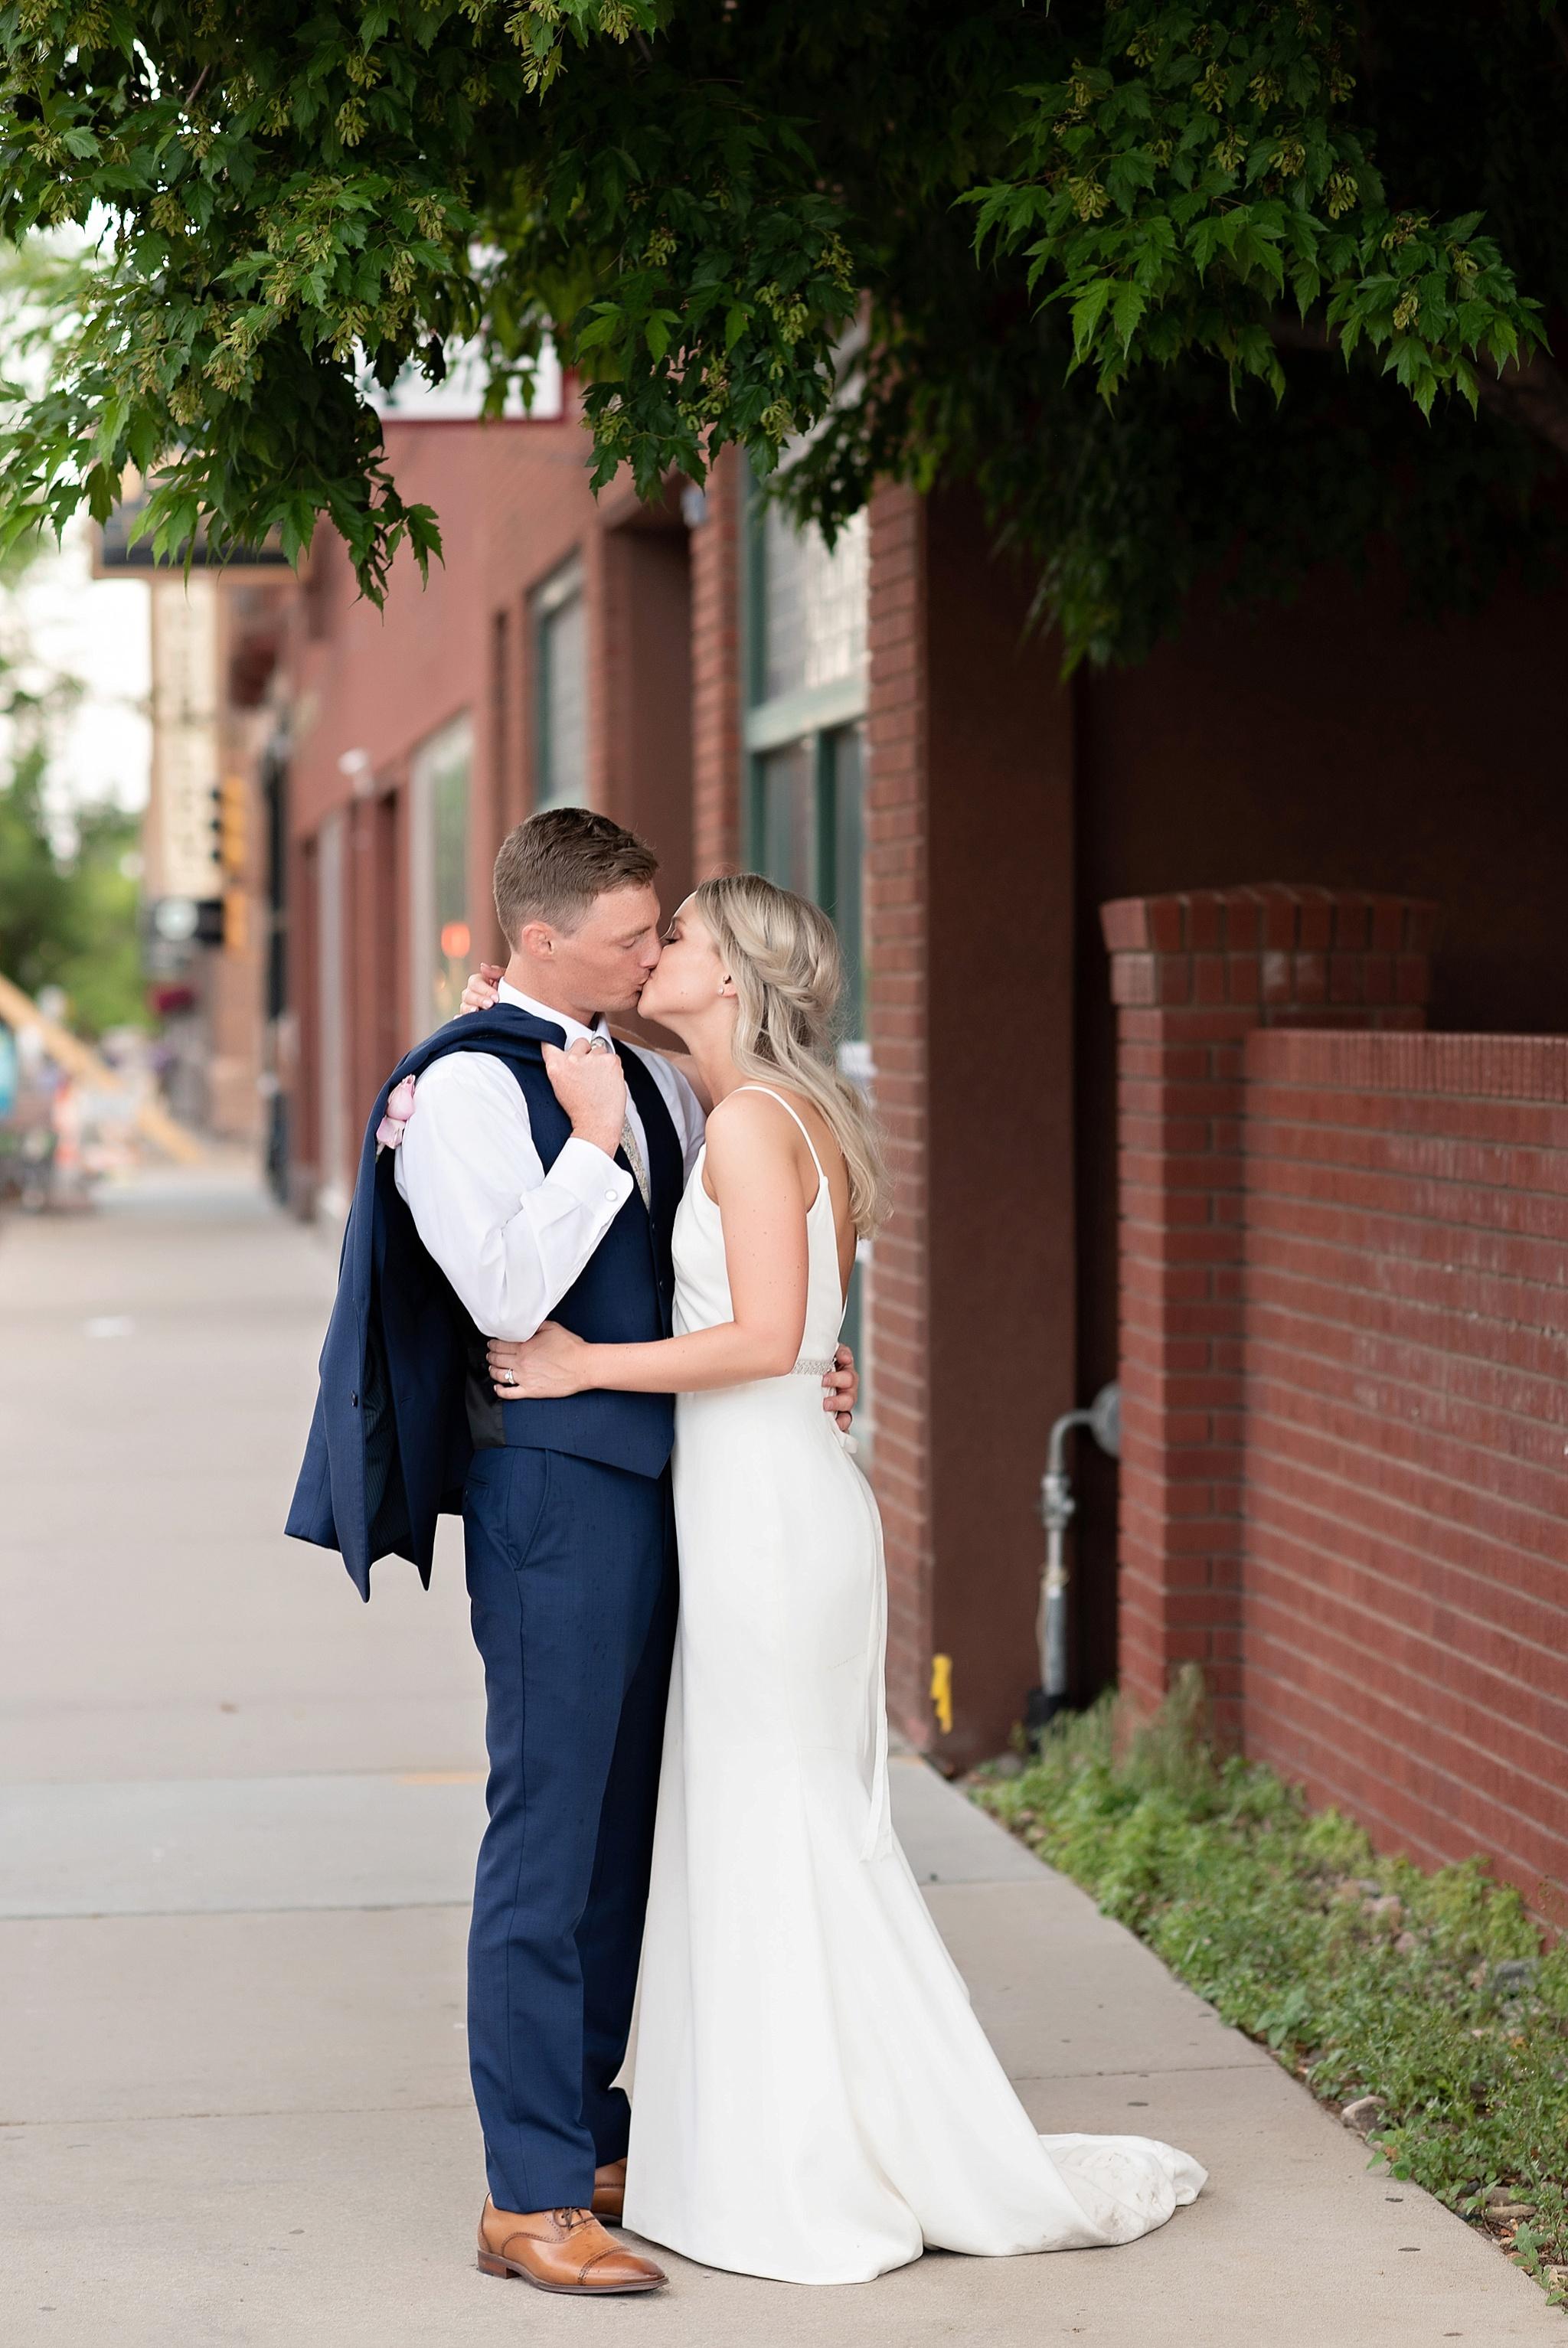 kate jones studios bridal portraits sioux falls wedding south dakota downtown sf